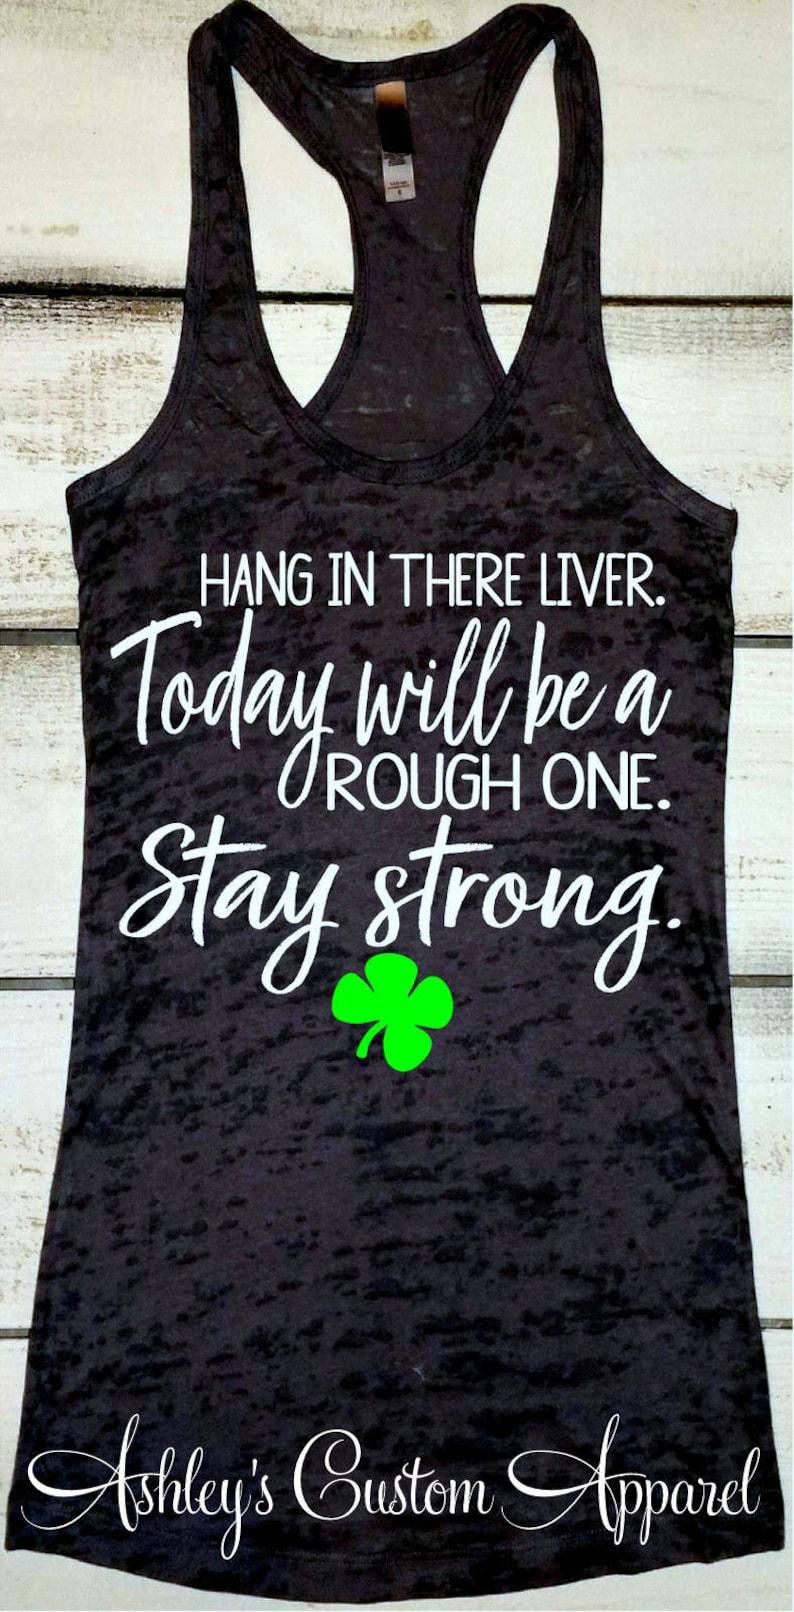 5f0963b4b Funny St. Patrick's Day Shirt For Women Liver Shirt | Etsy